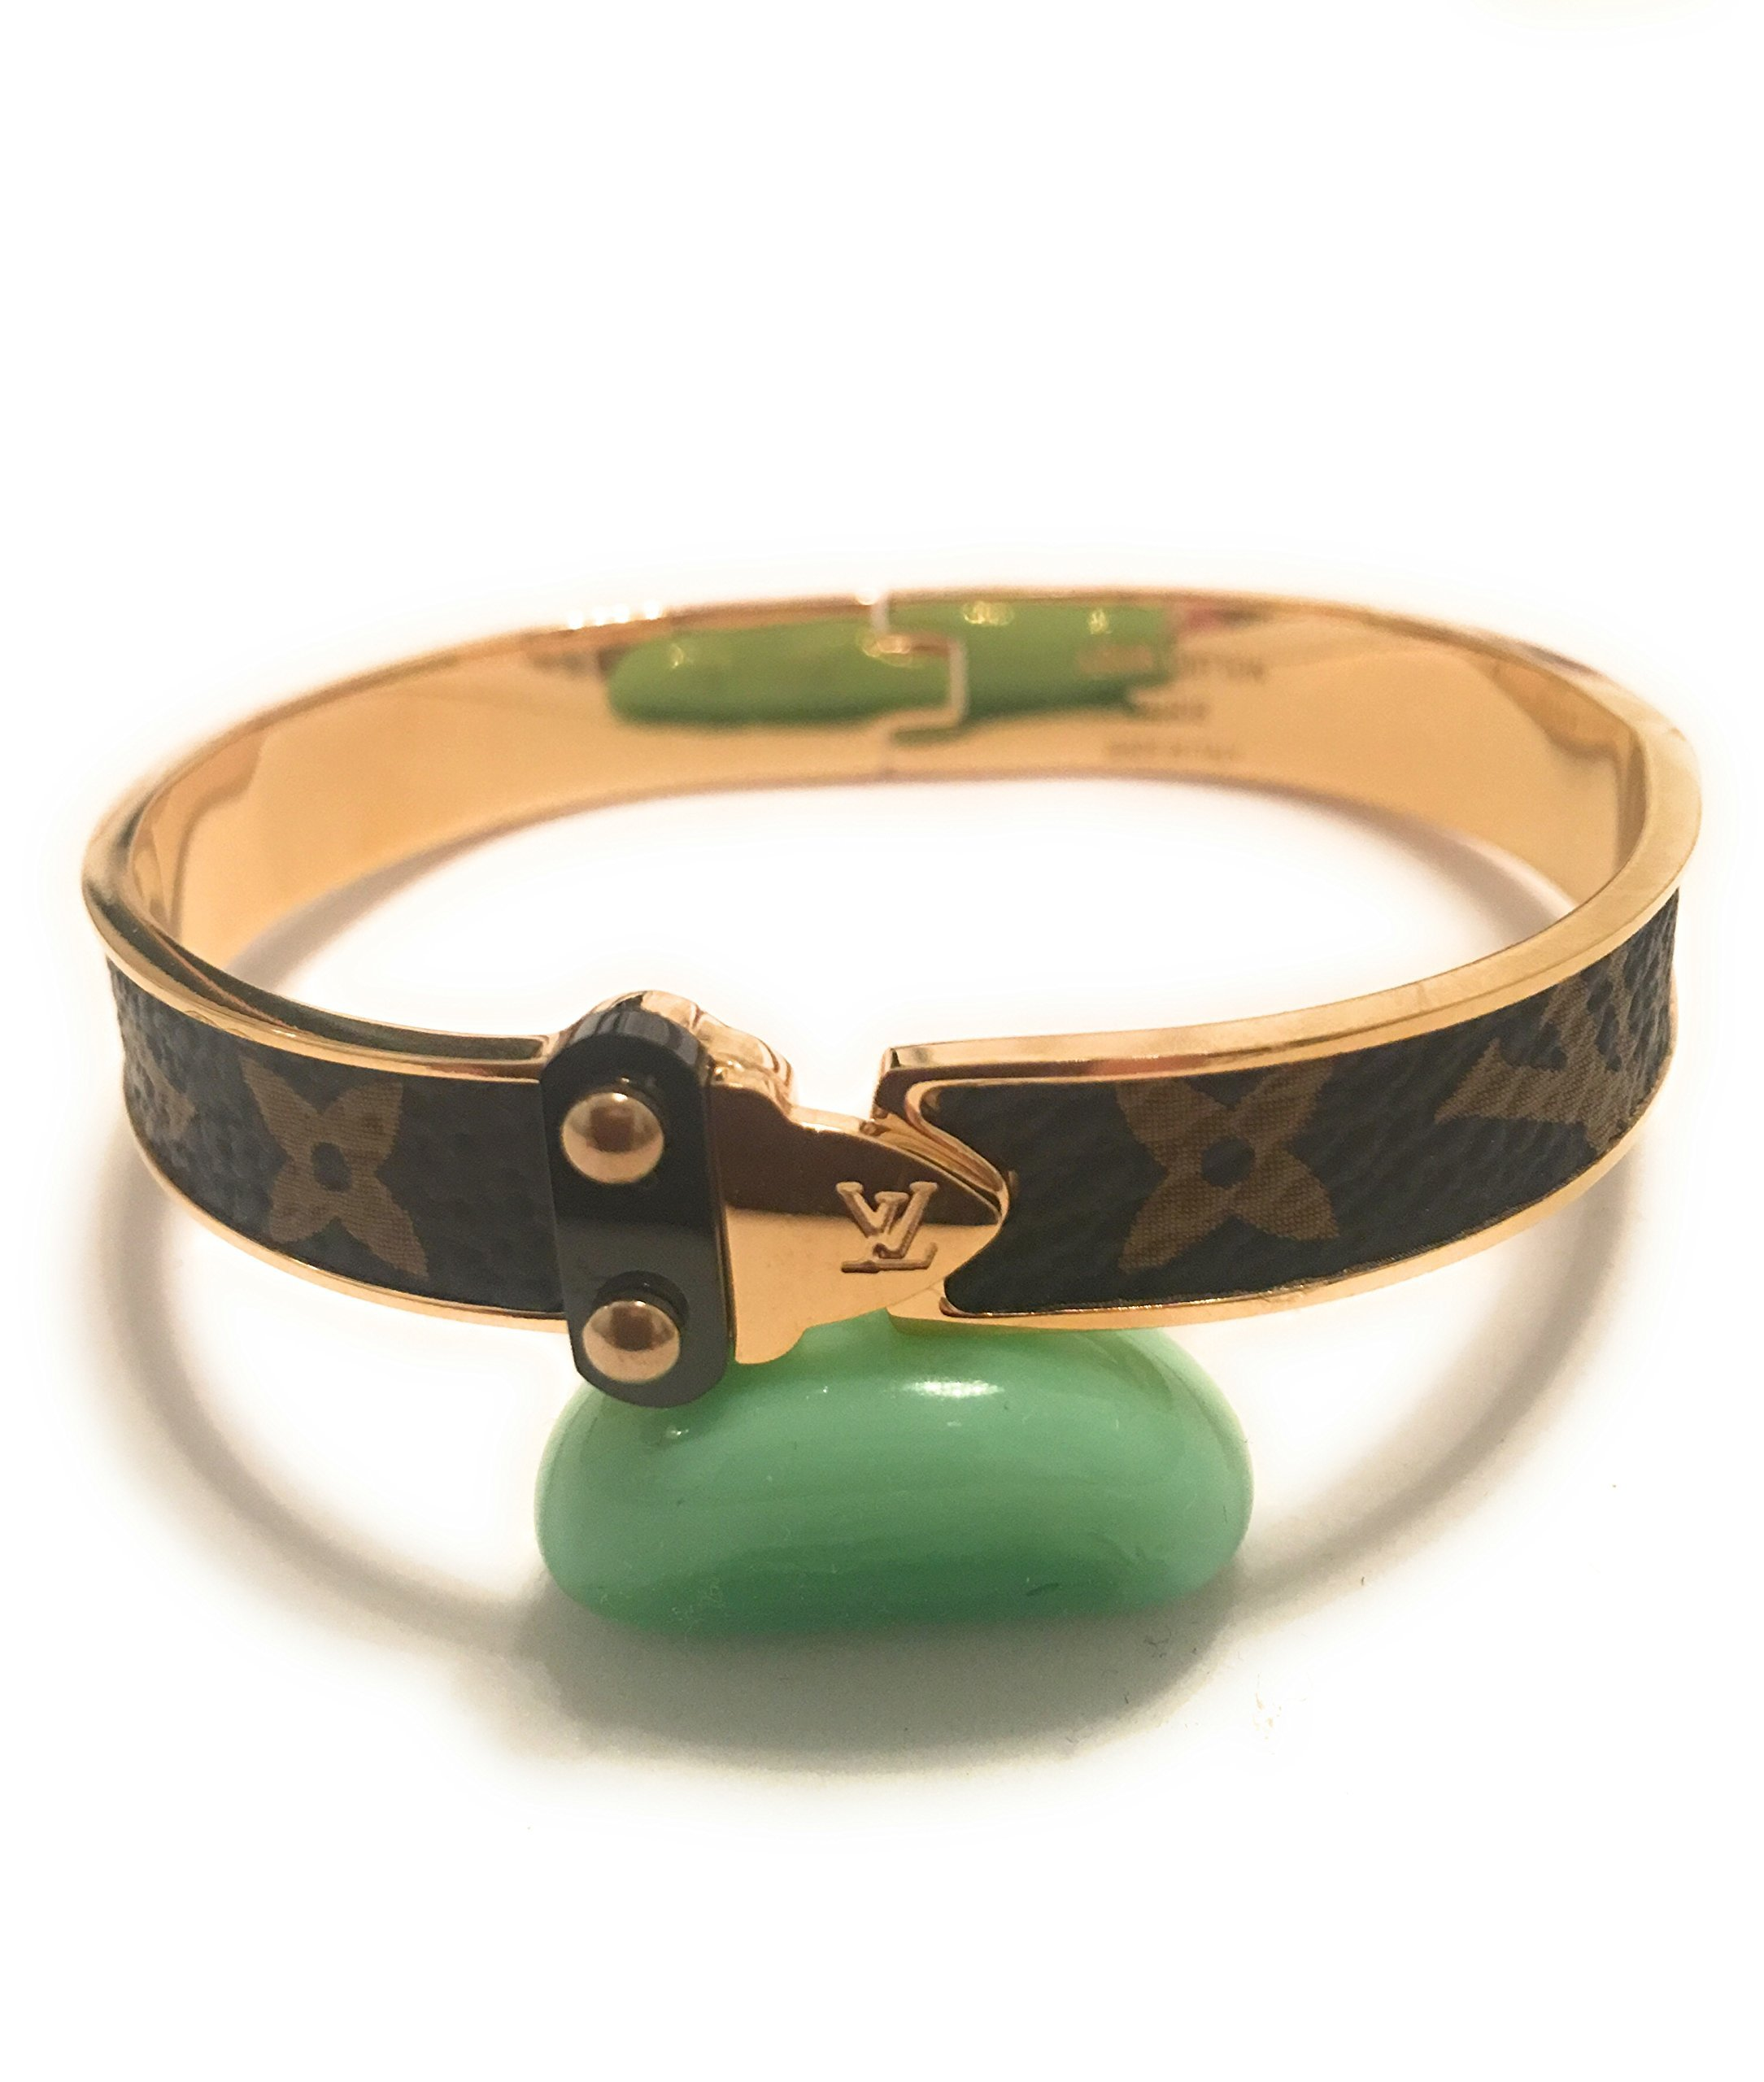 KC luxury Woman Monogram Luxury Cuff Gold Bracelets Gold Bangle Bracelet